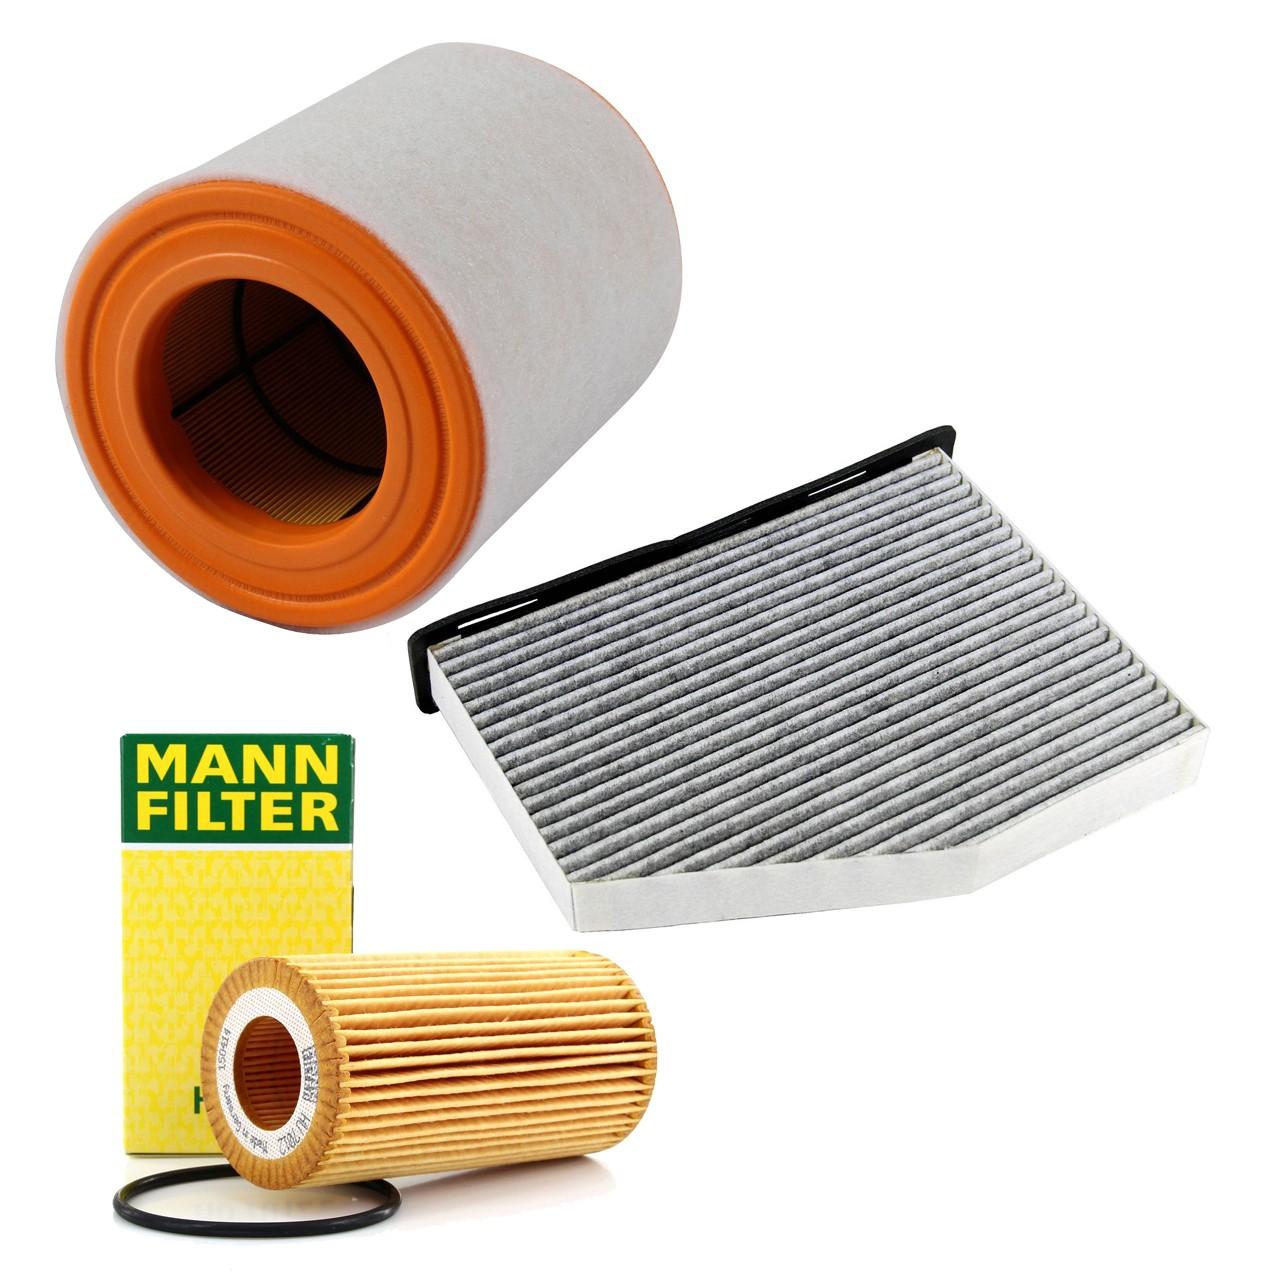 Inspektionskit Filterpaket Filterset für Audi A6 (4G C7) A7 4G 3.0TDI 211-272 PS